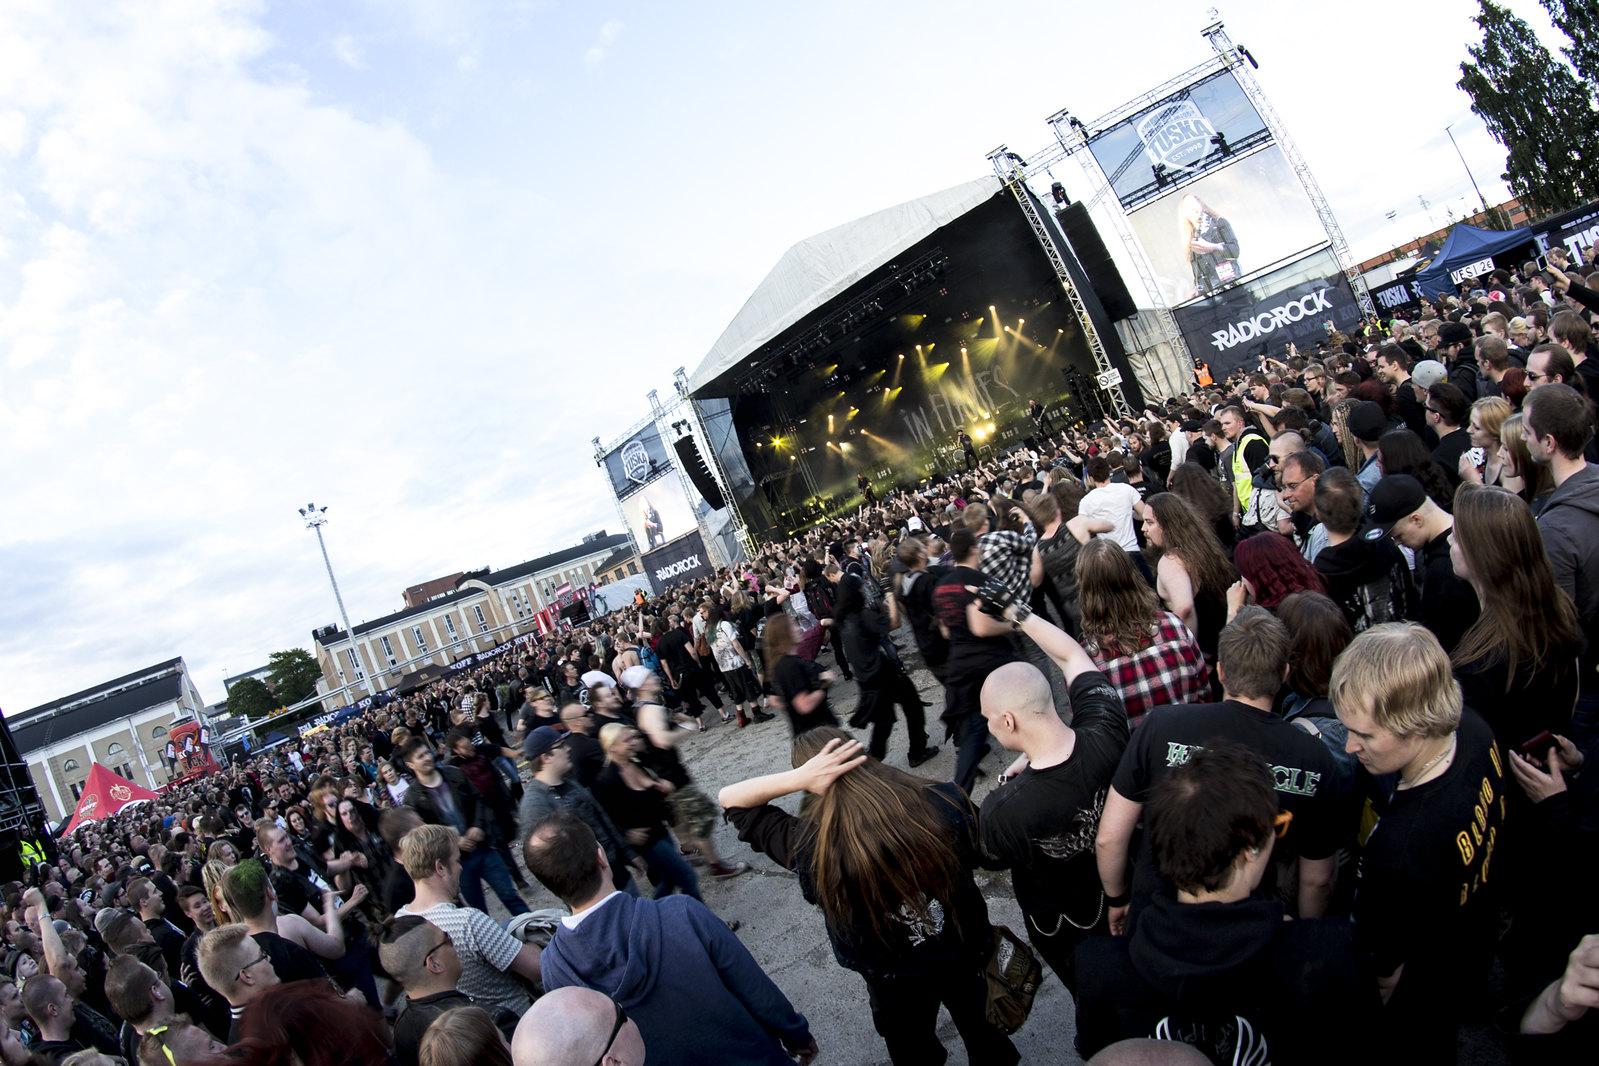 tuska open air metal festival, in flames in helsinki, tuska metal festival, tuska, finnish metal festival